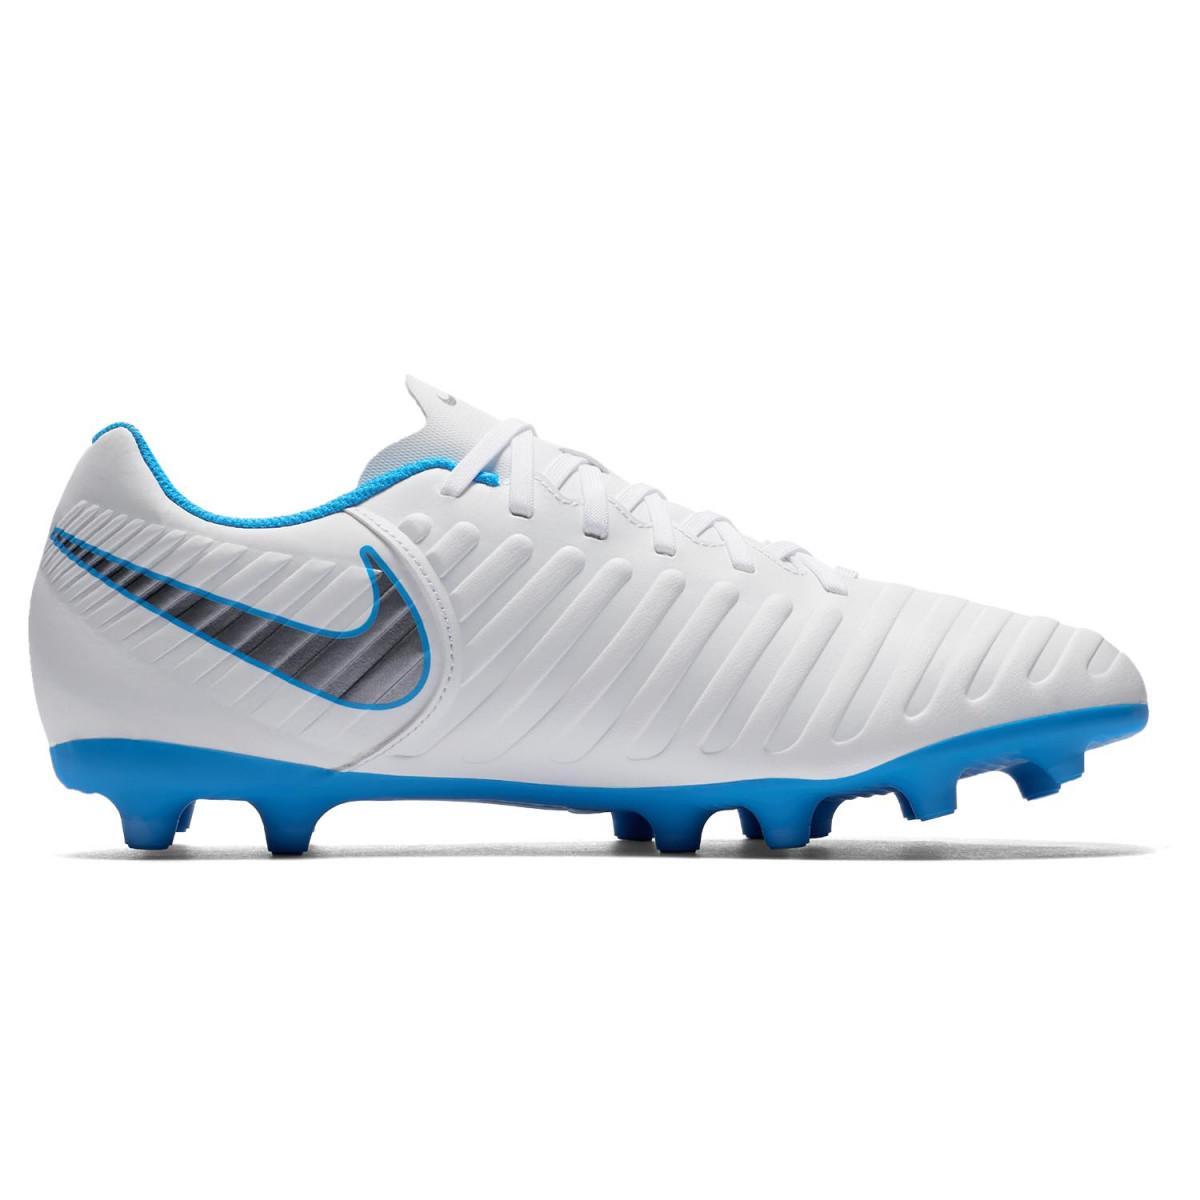 Botines Nike Legend 7 Club Fg - Fútbol - Disciplina 6df88e2596844